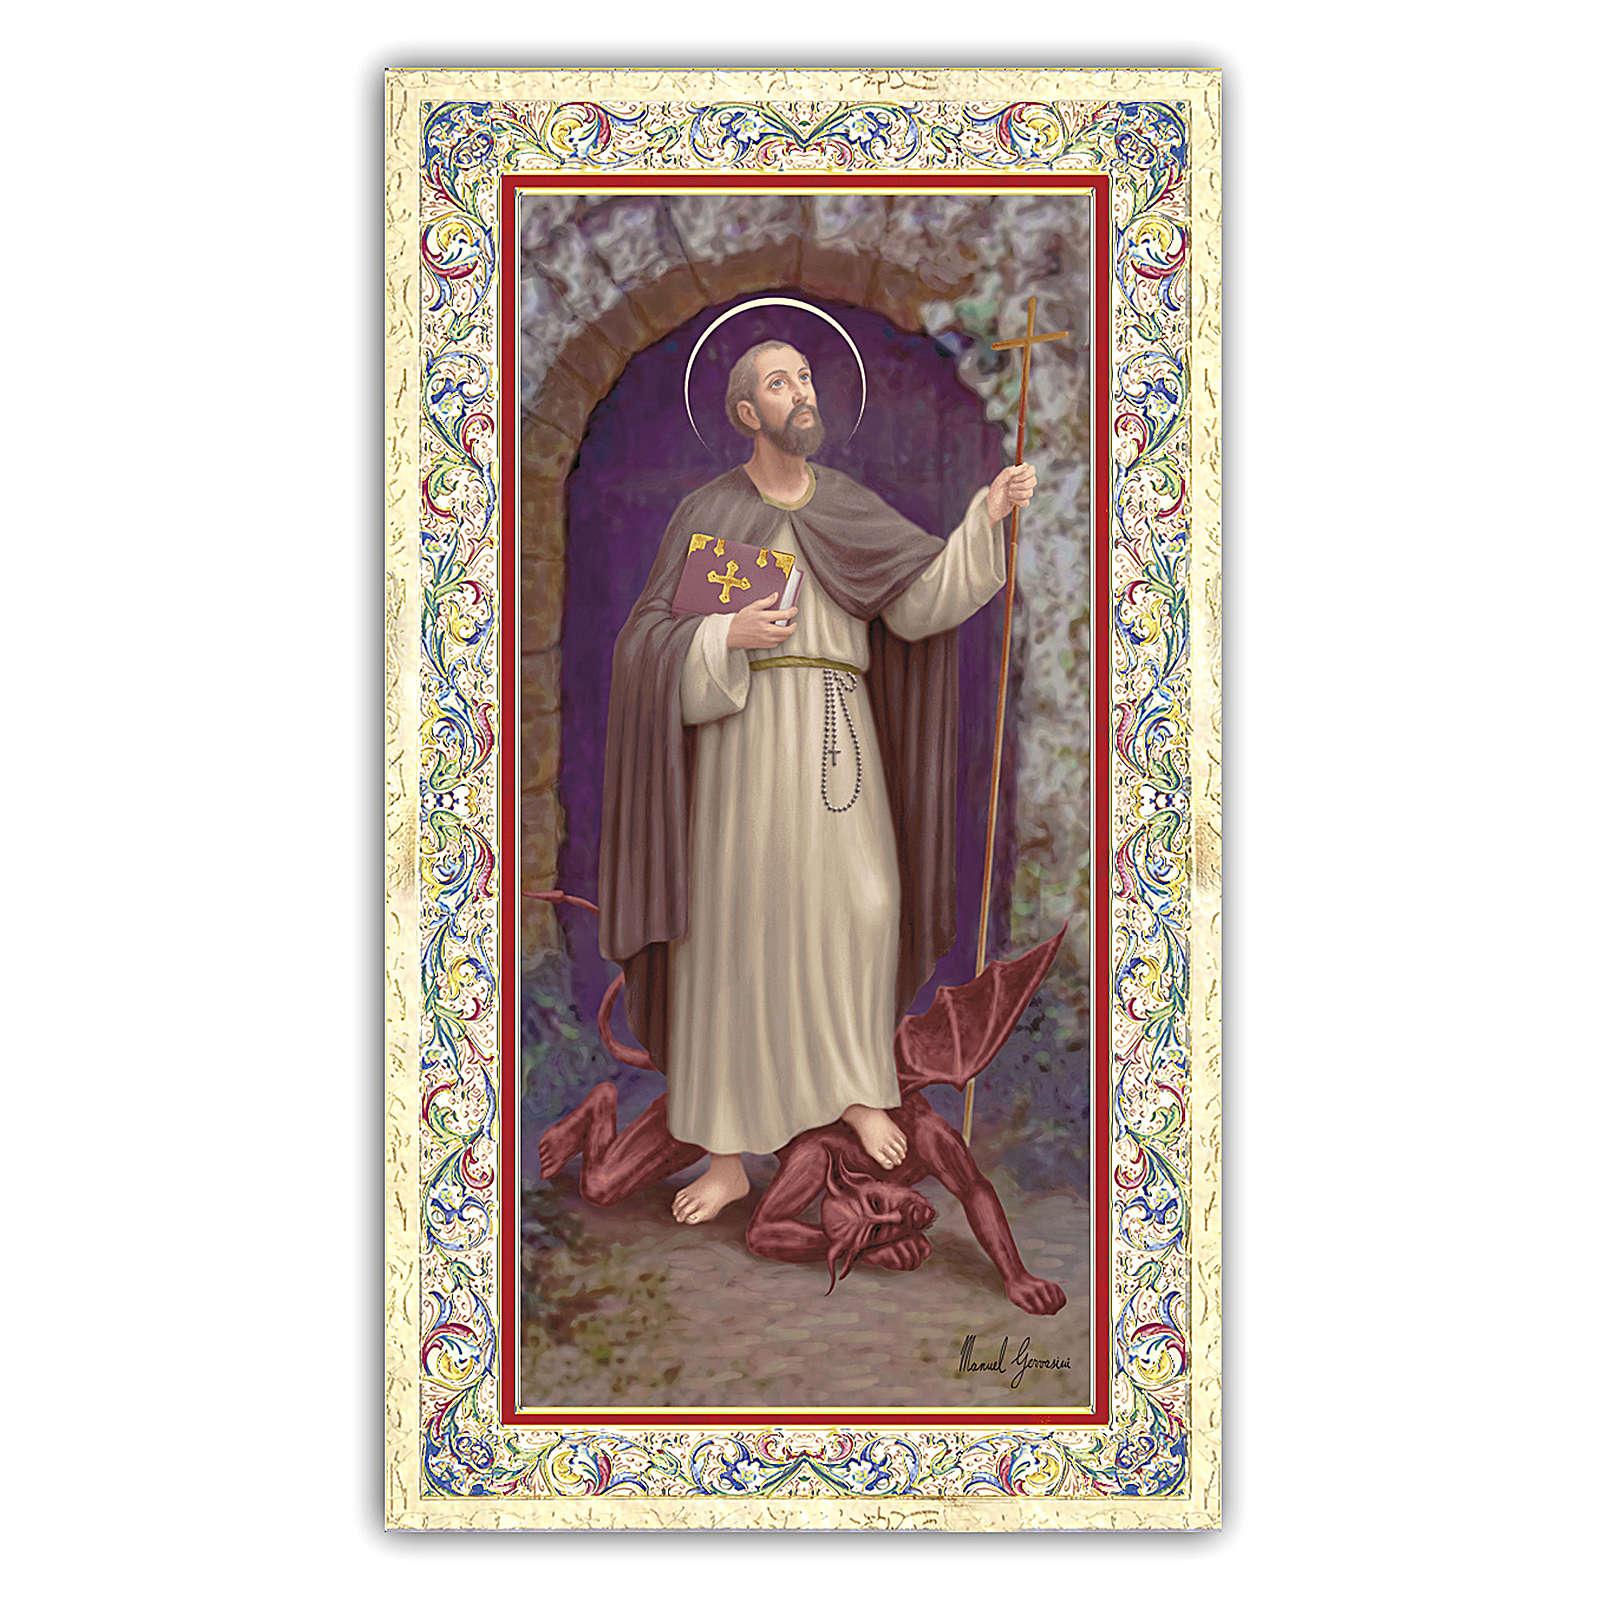 Santino San Guglielmo 10x5 cm ITA 4